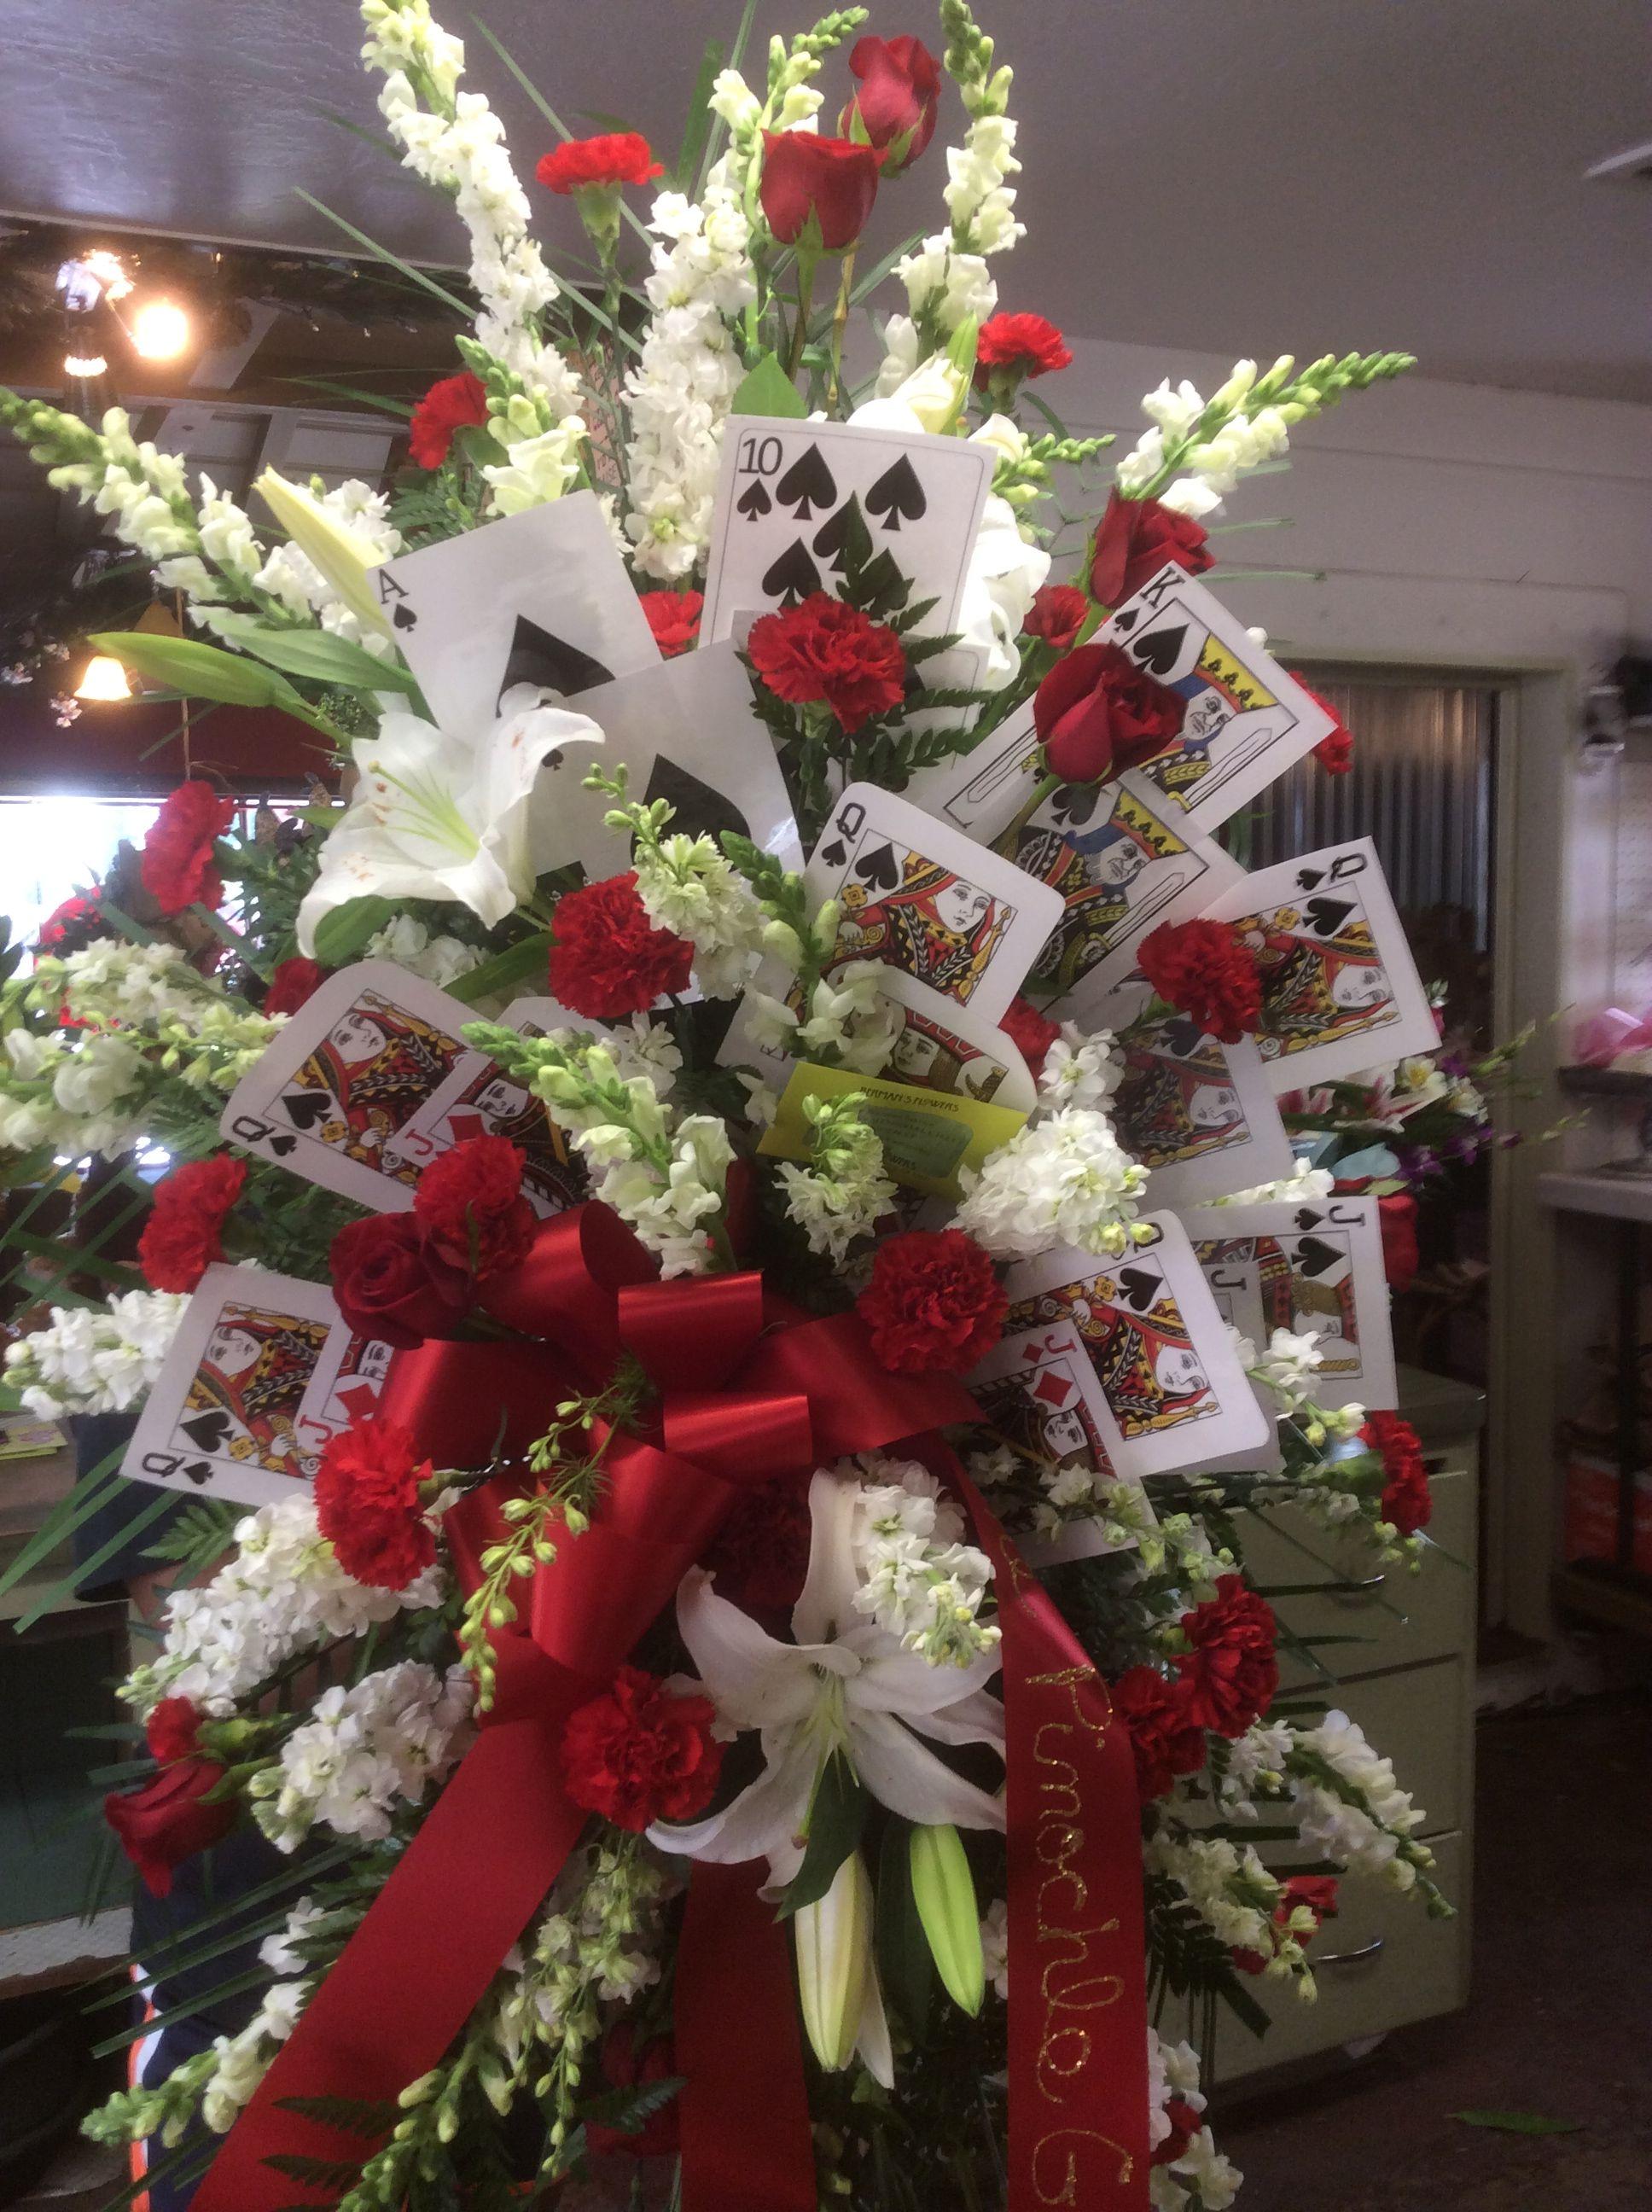 Pin By Leslie Carpenter On Flower Ideas Pinterest Funeral